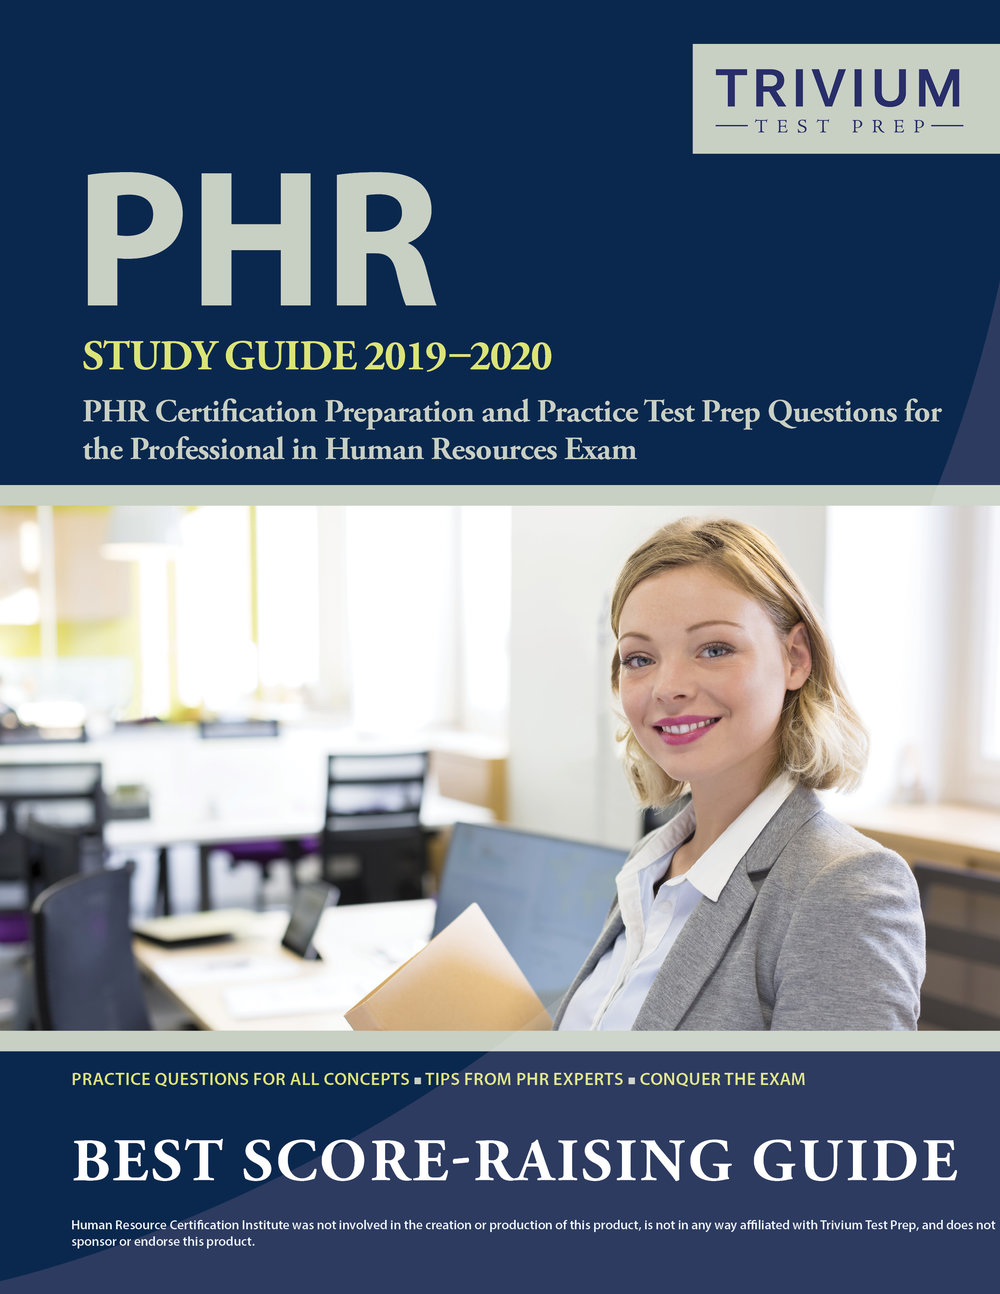 Phr Study Guide 2019 2020 Trivium Test Prep Test Prep